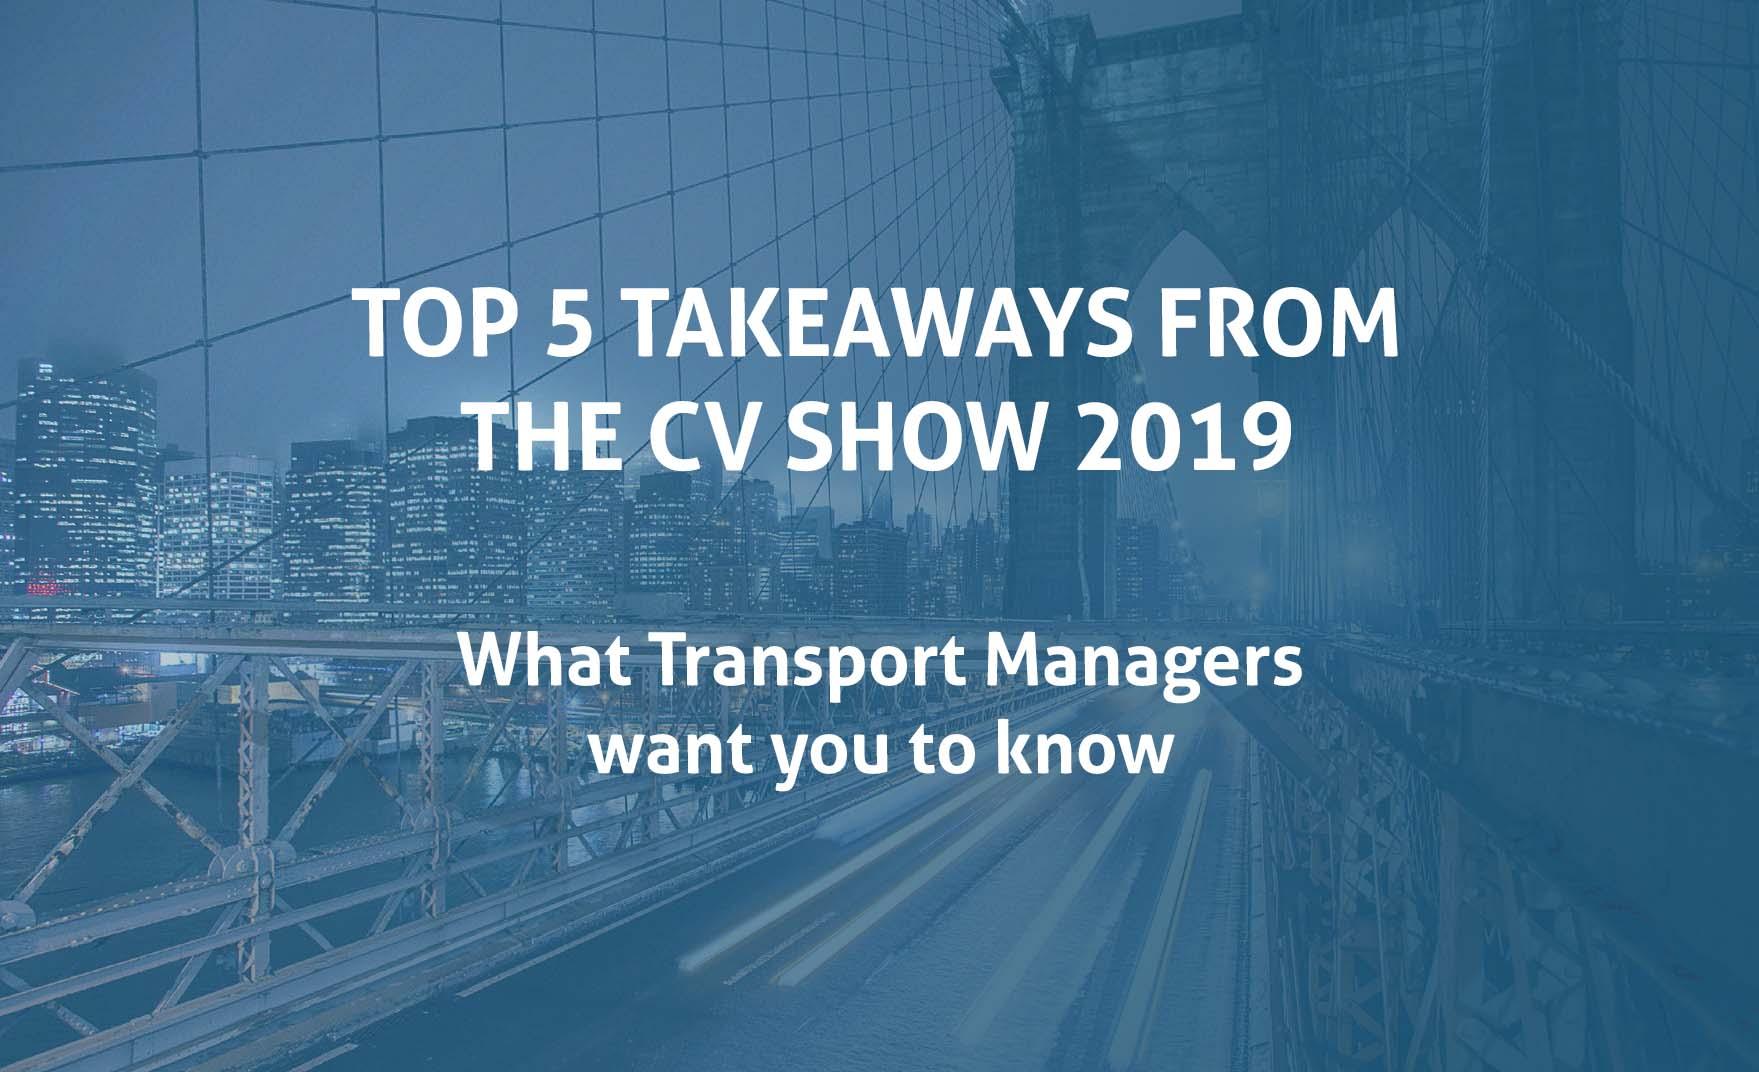 CVShow2019-Top5takeaways.jpg